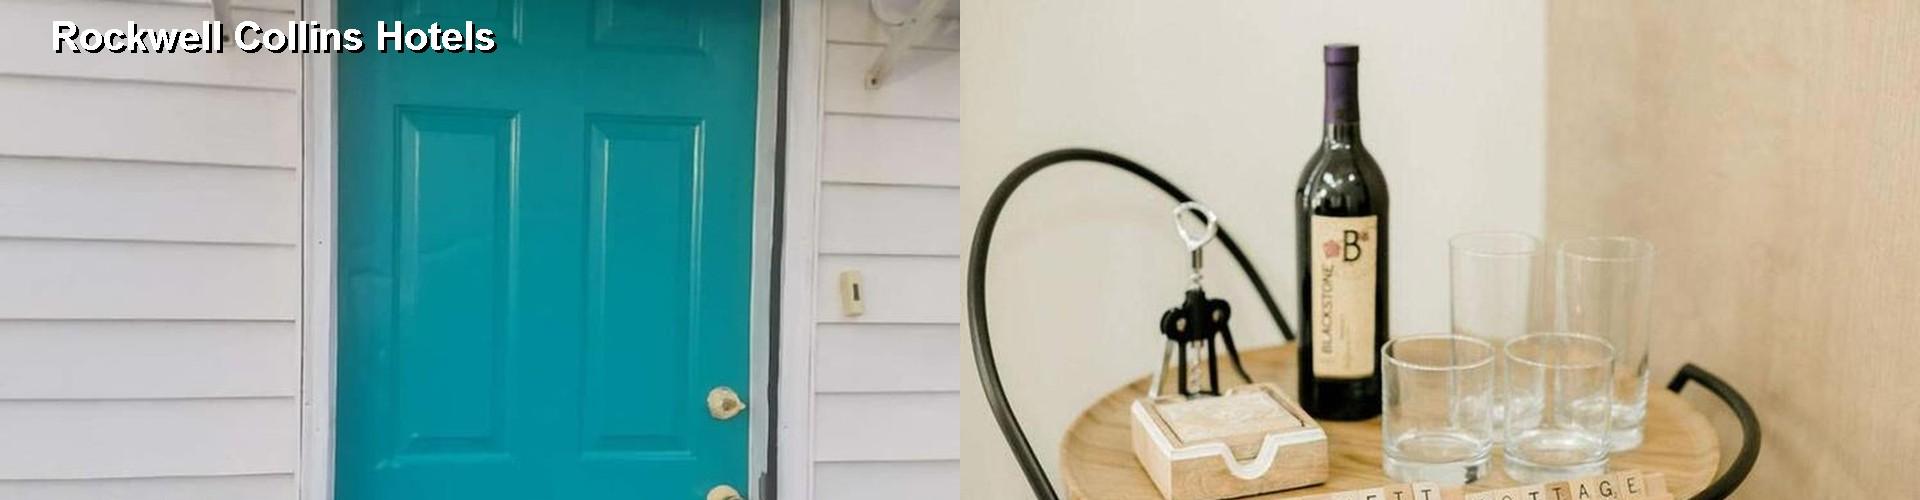 5 Best Hotels Near Rockwell Collins